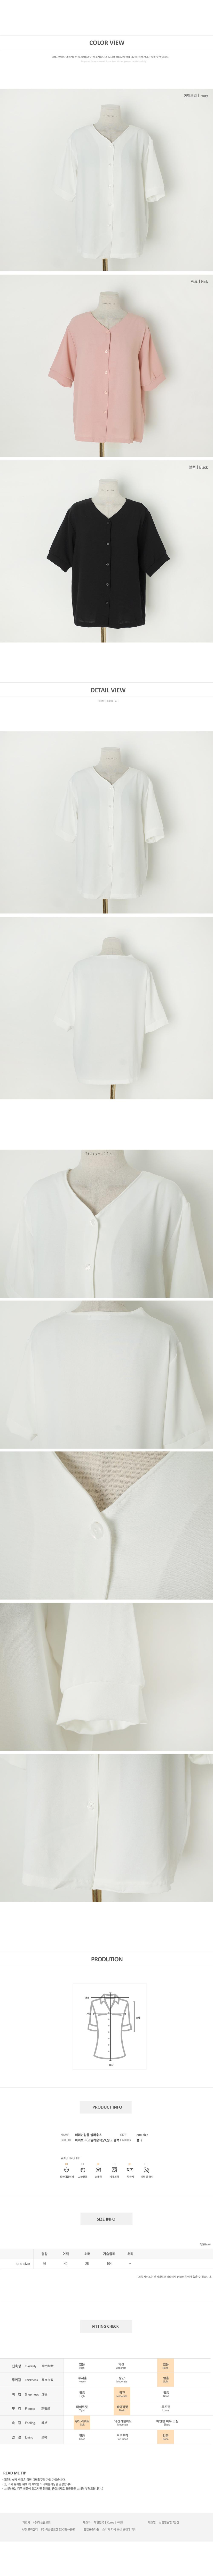 Feminine simple blouse